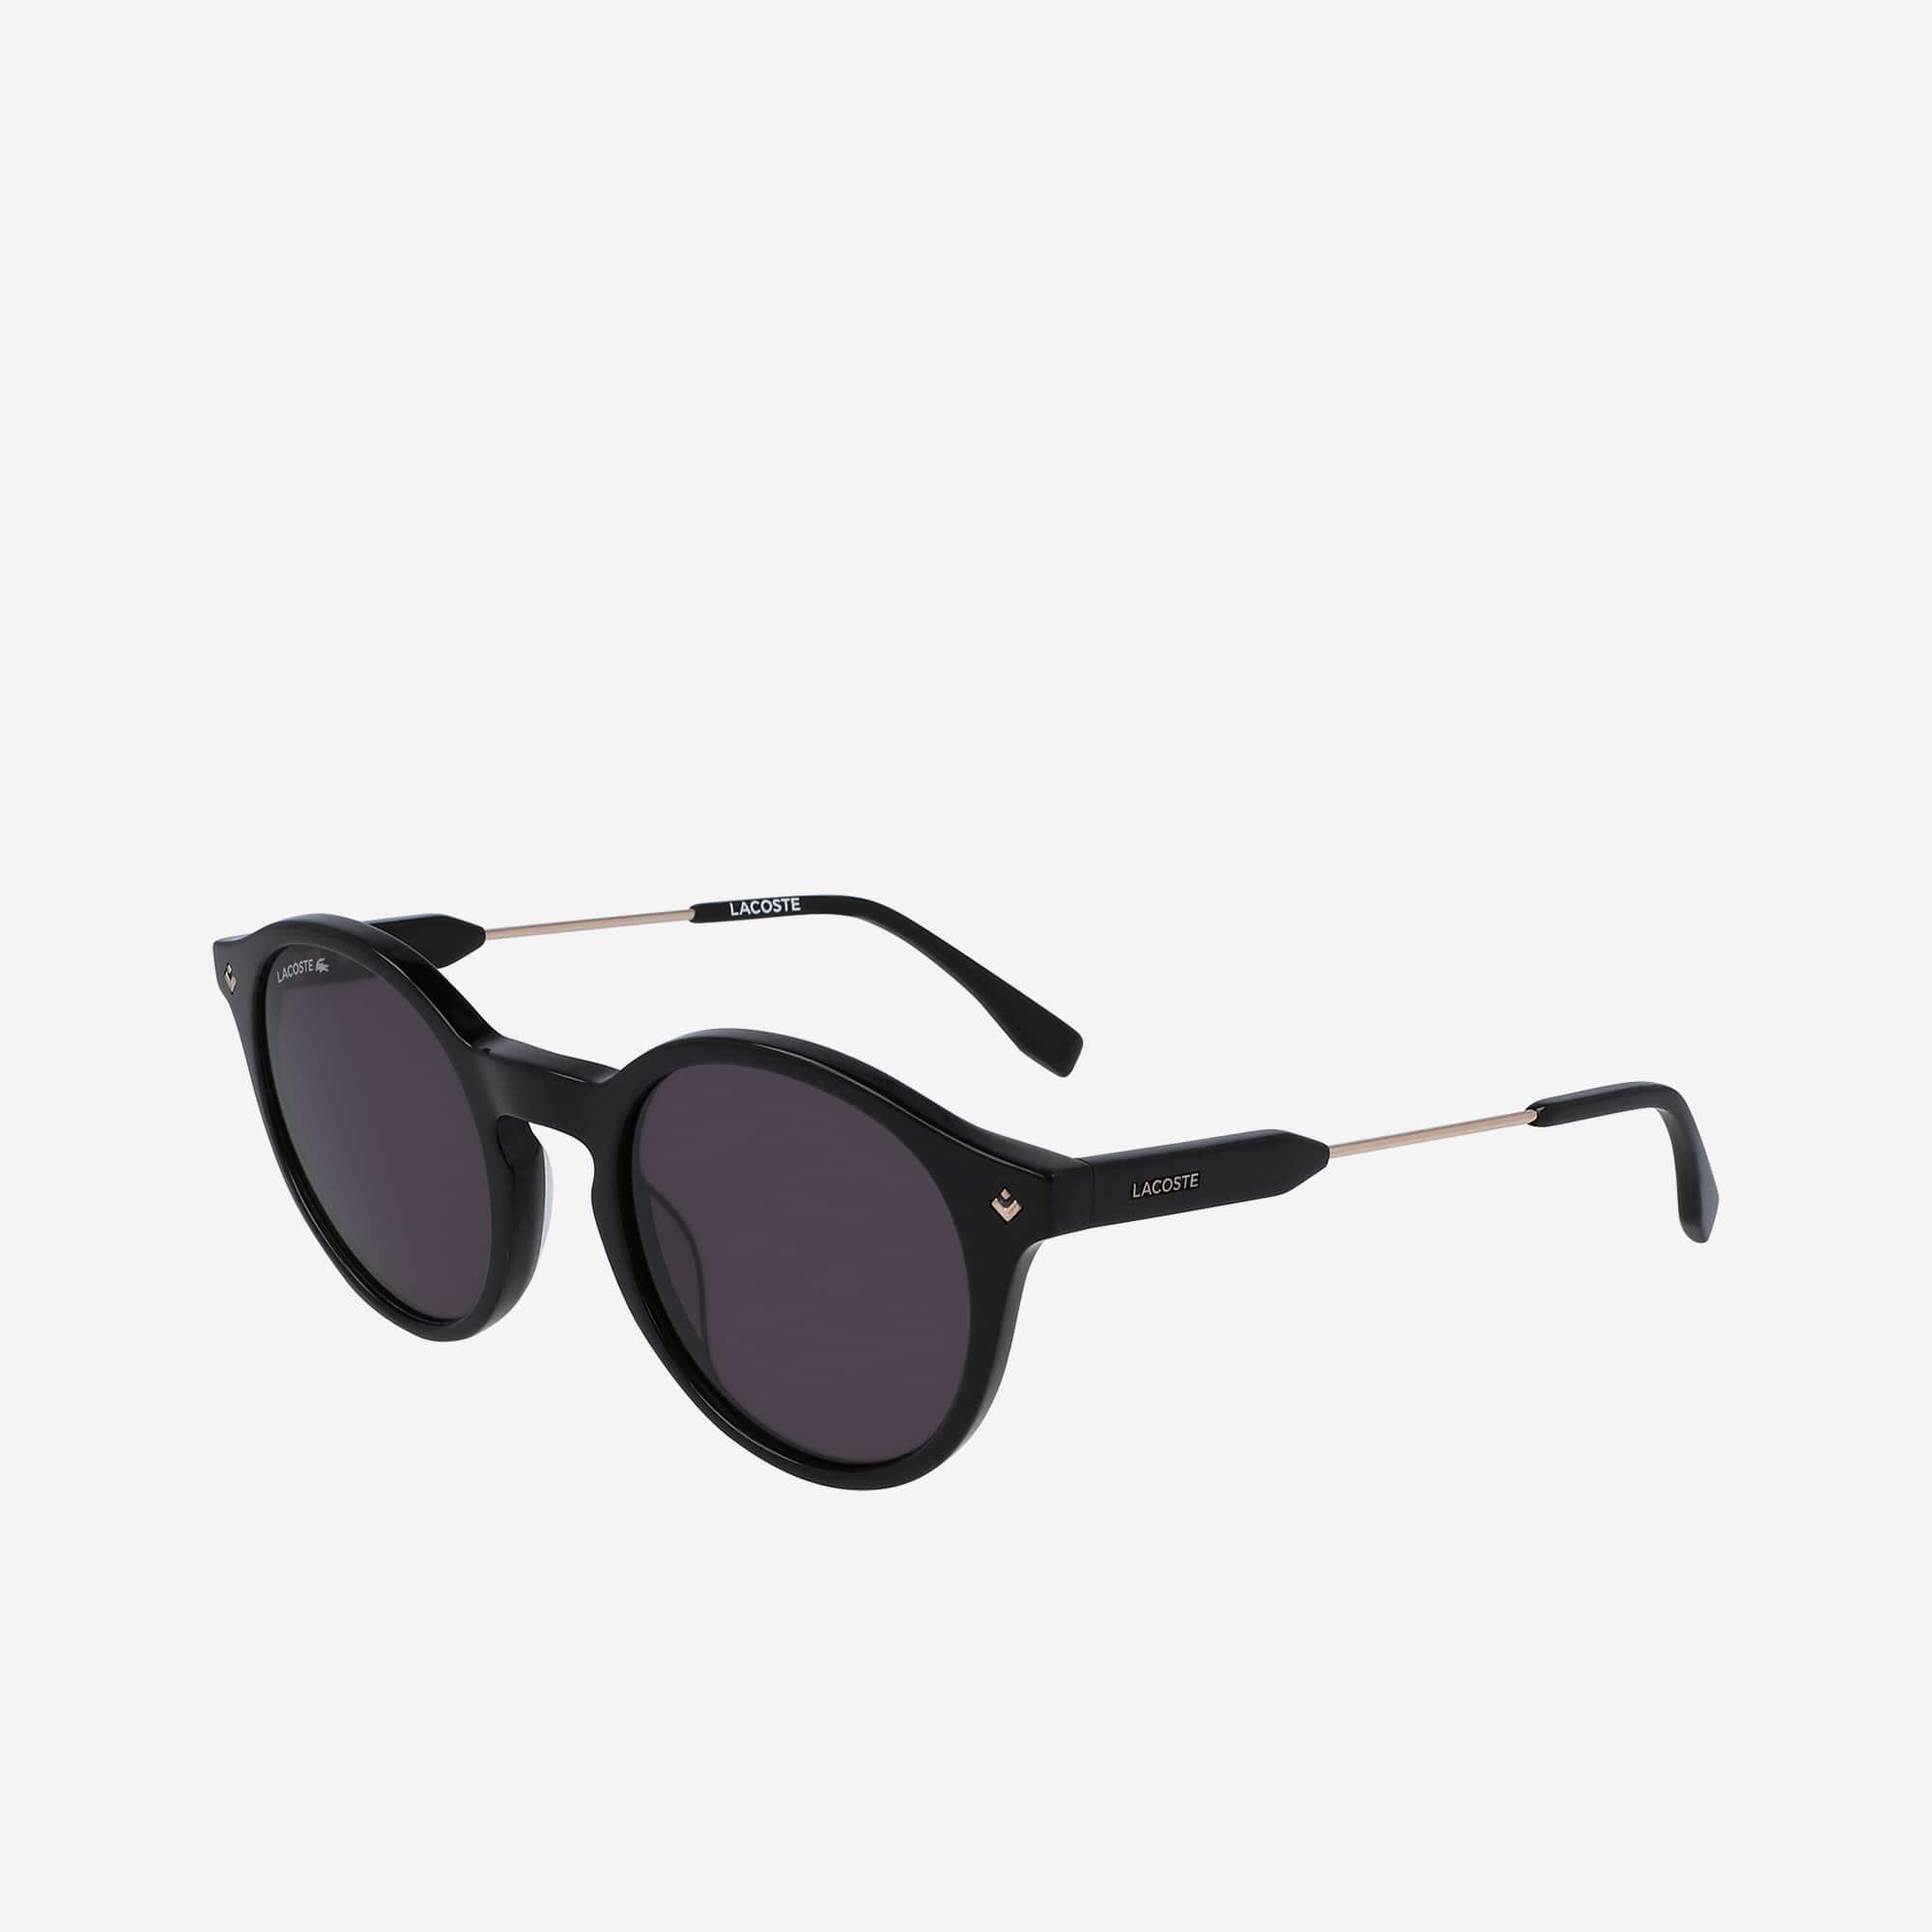 933b4134c82 Sunglasses for women